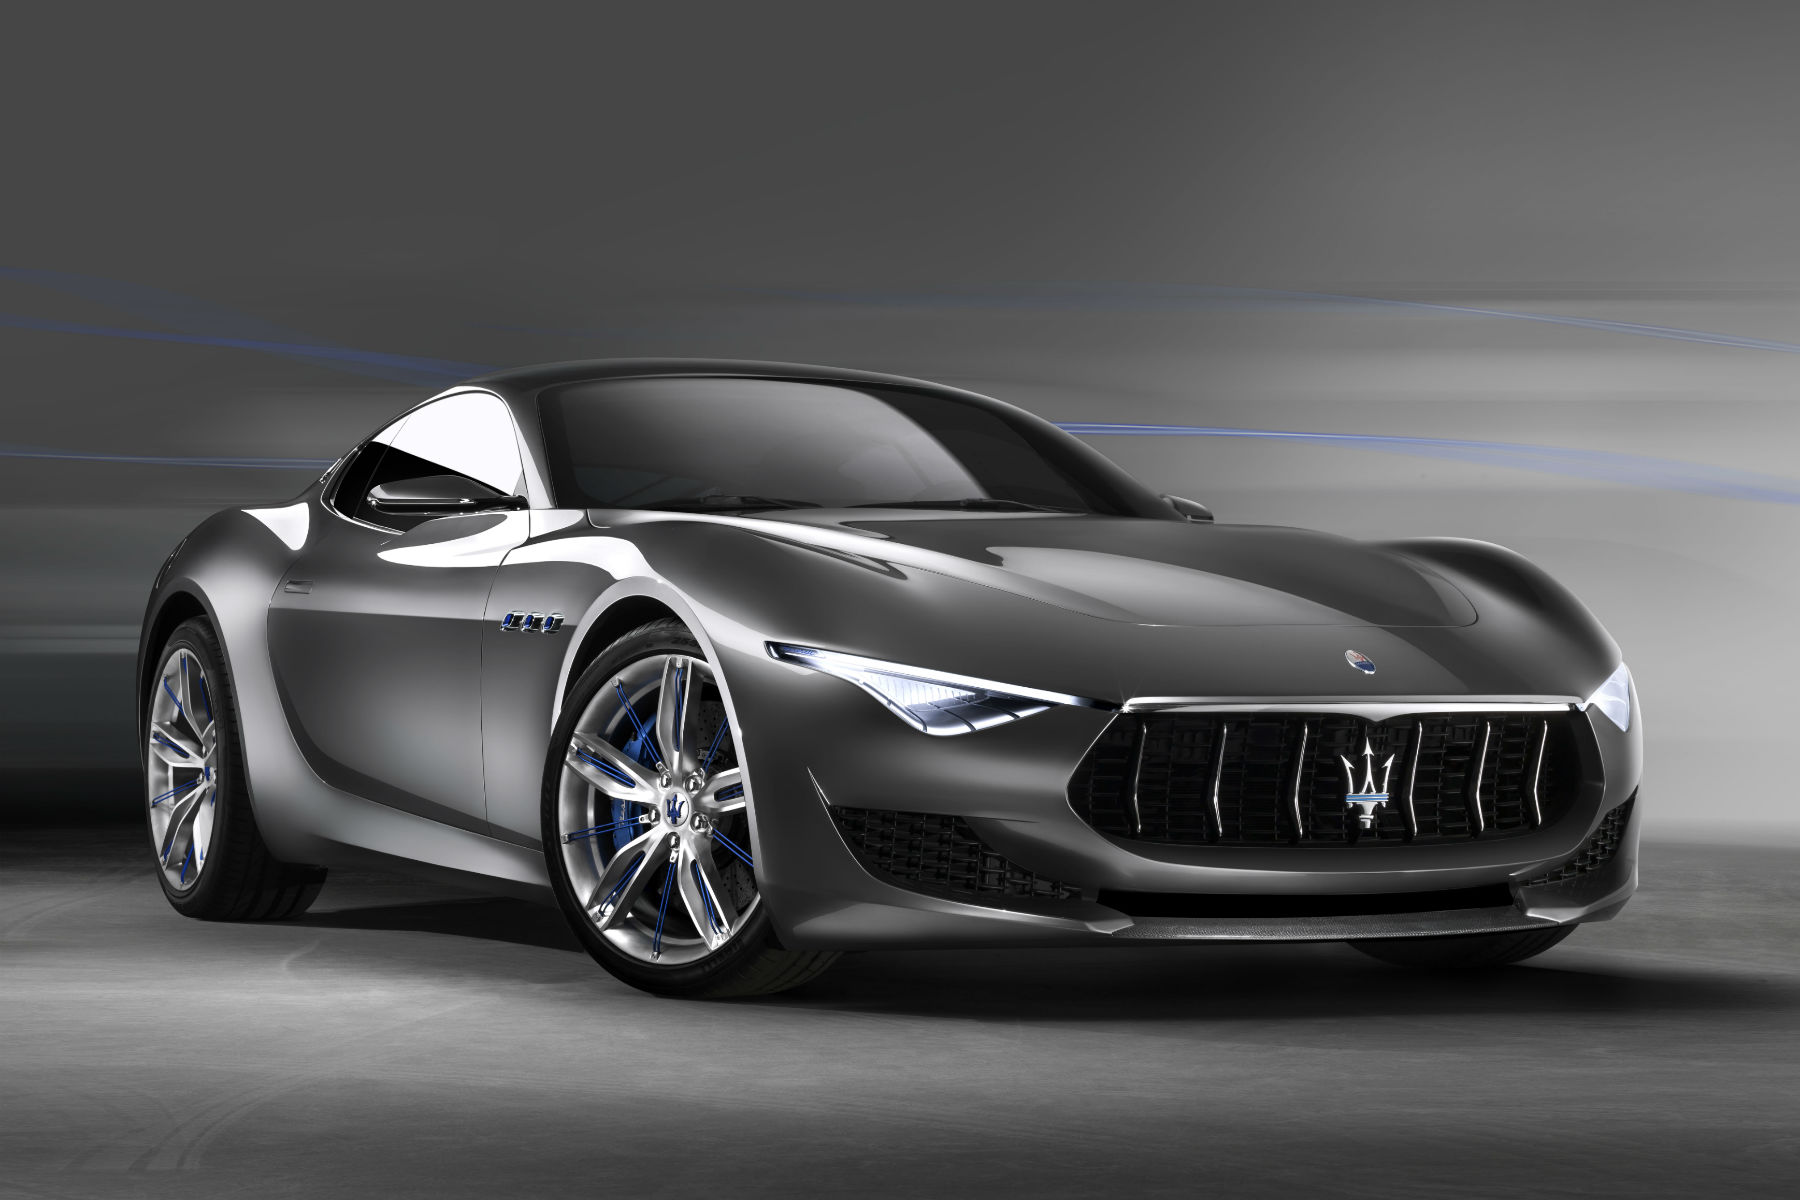 =4: Maserati - 12,500,000